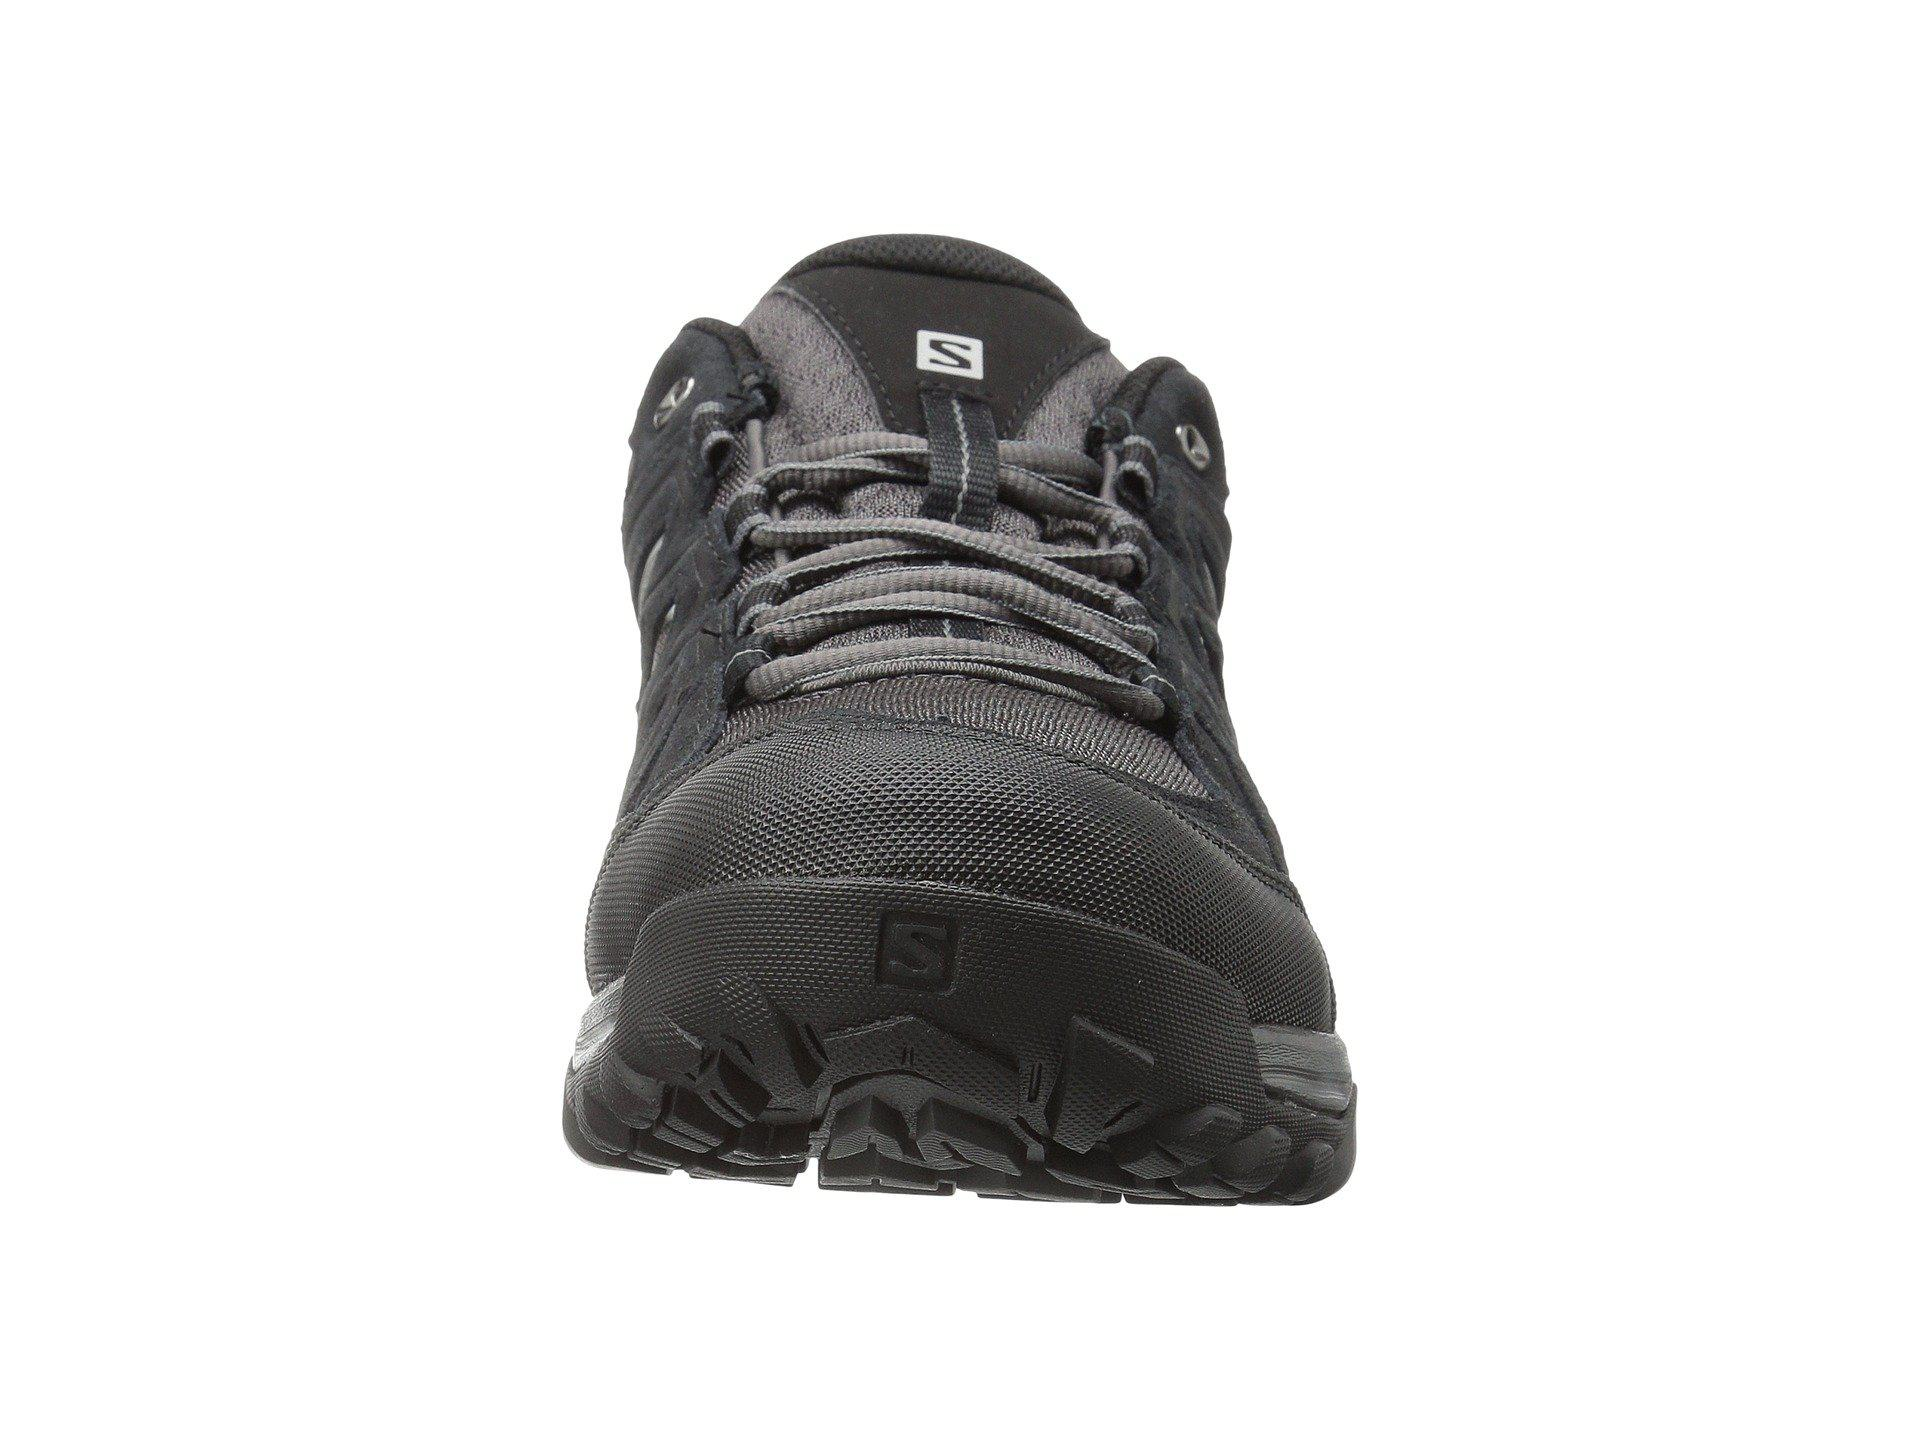 536e620f65ac Yves Salomon - Black Evasion 2 Aero Hiking Shoe for Men - Lyst. View  fullscreen